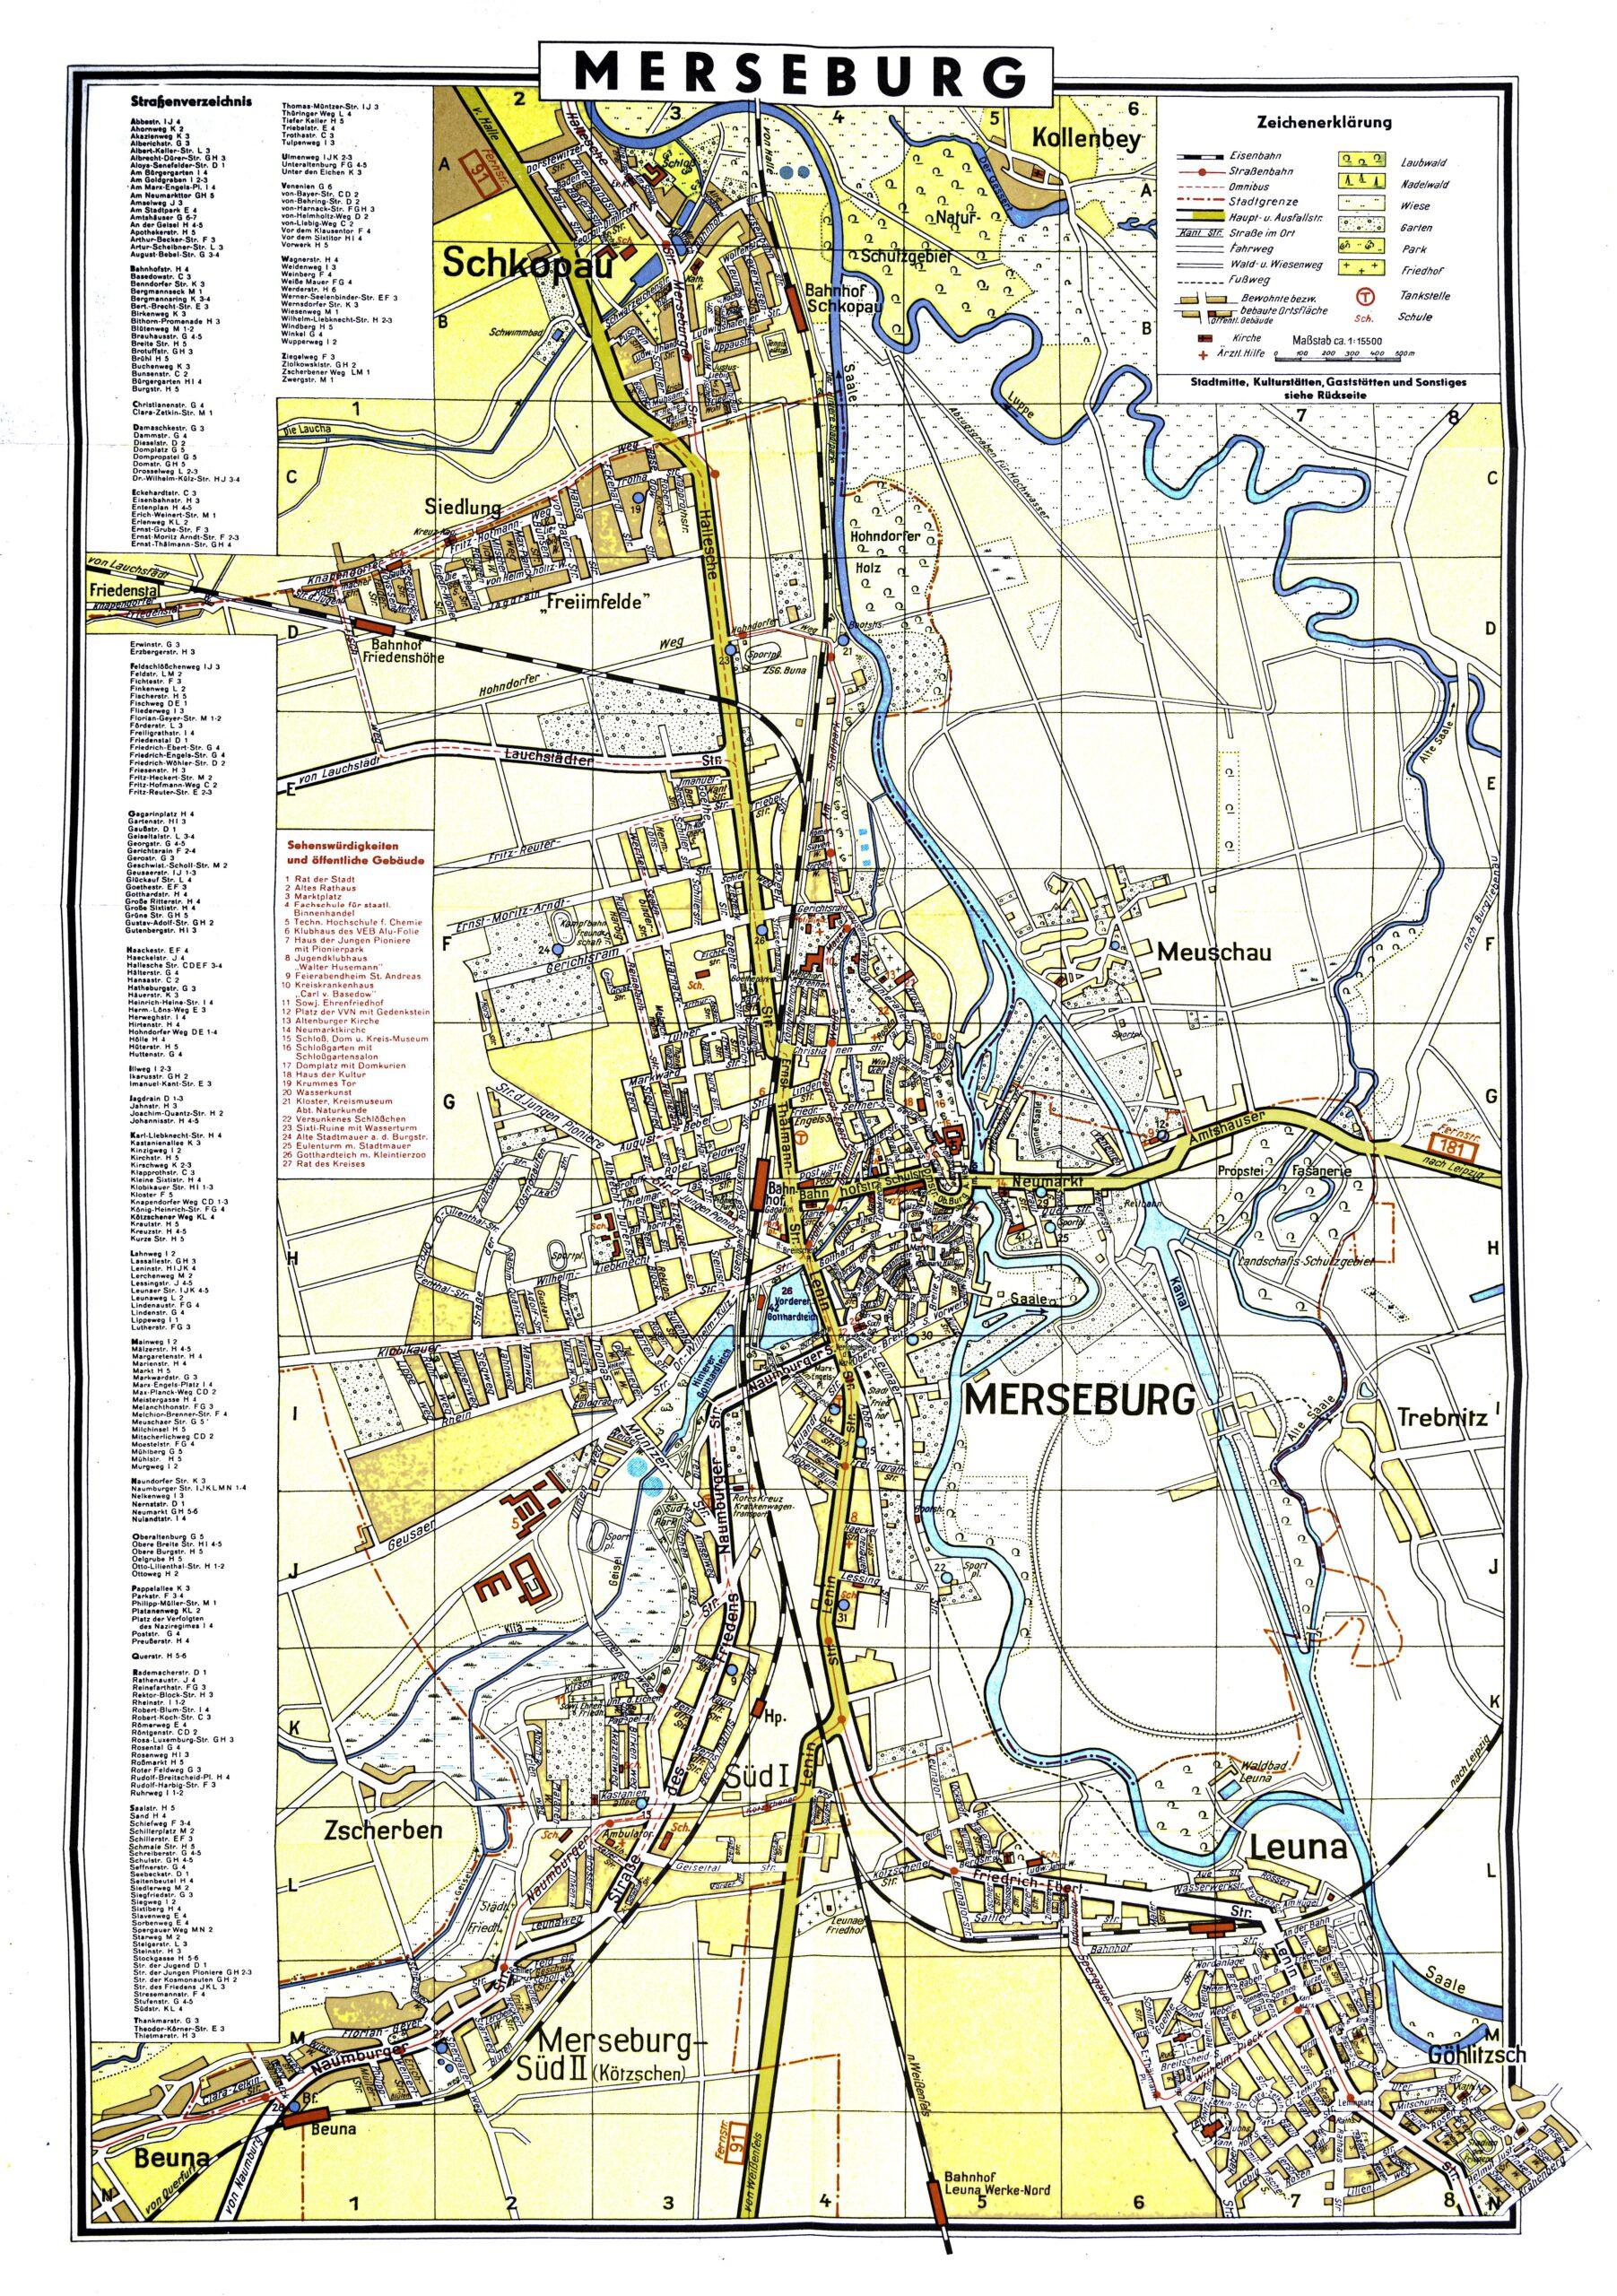 1963-Stadtplan Merseburg mit Straßenregister